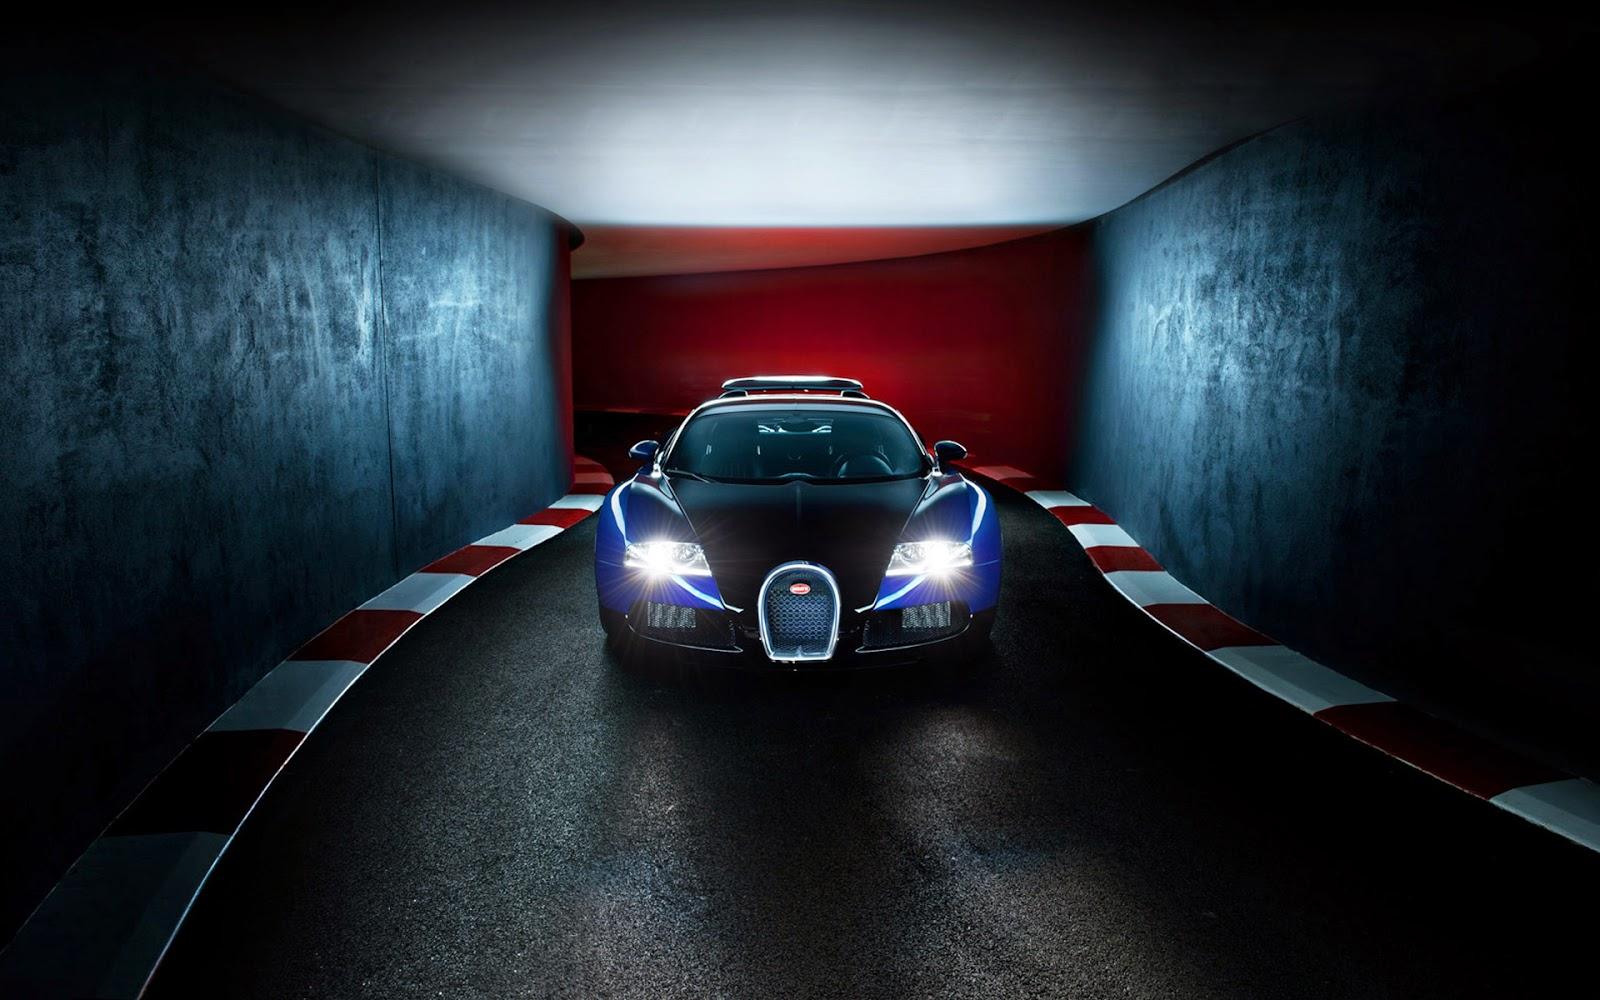 "<img src=""http://1.bp.blogspot.com/-dA15p__UUQY/UzEwmY-TDuI/AAAAAAAALM0/-YaIuRnUeFs/s1600/bugatti-wallpaper.jpg"" alt=""Bugatti Wallpapers"" />"